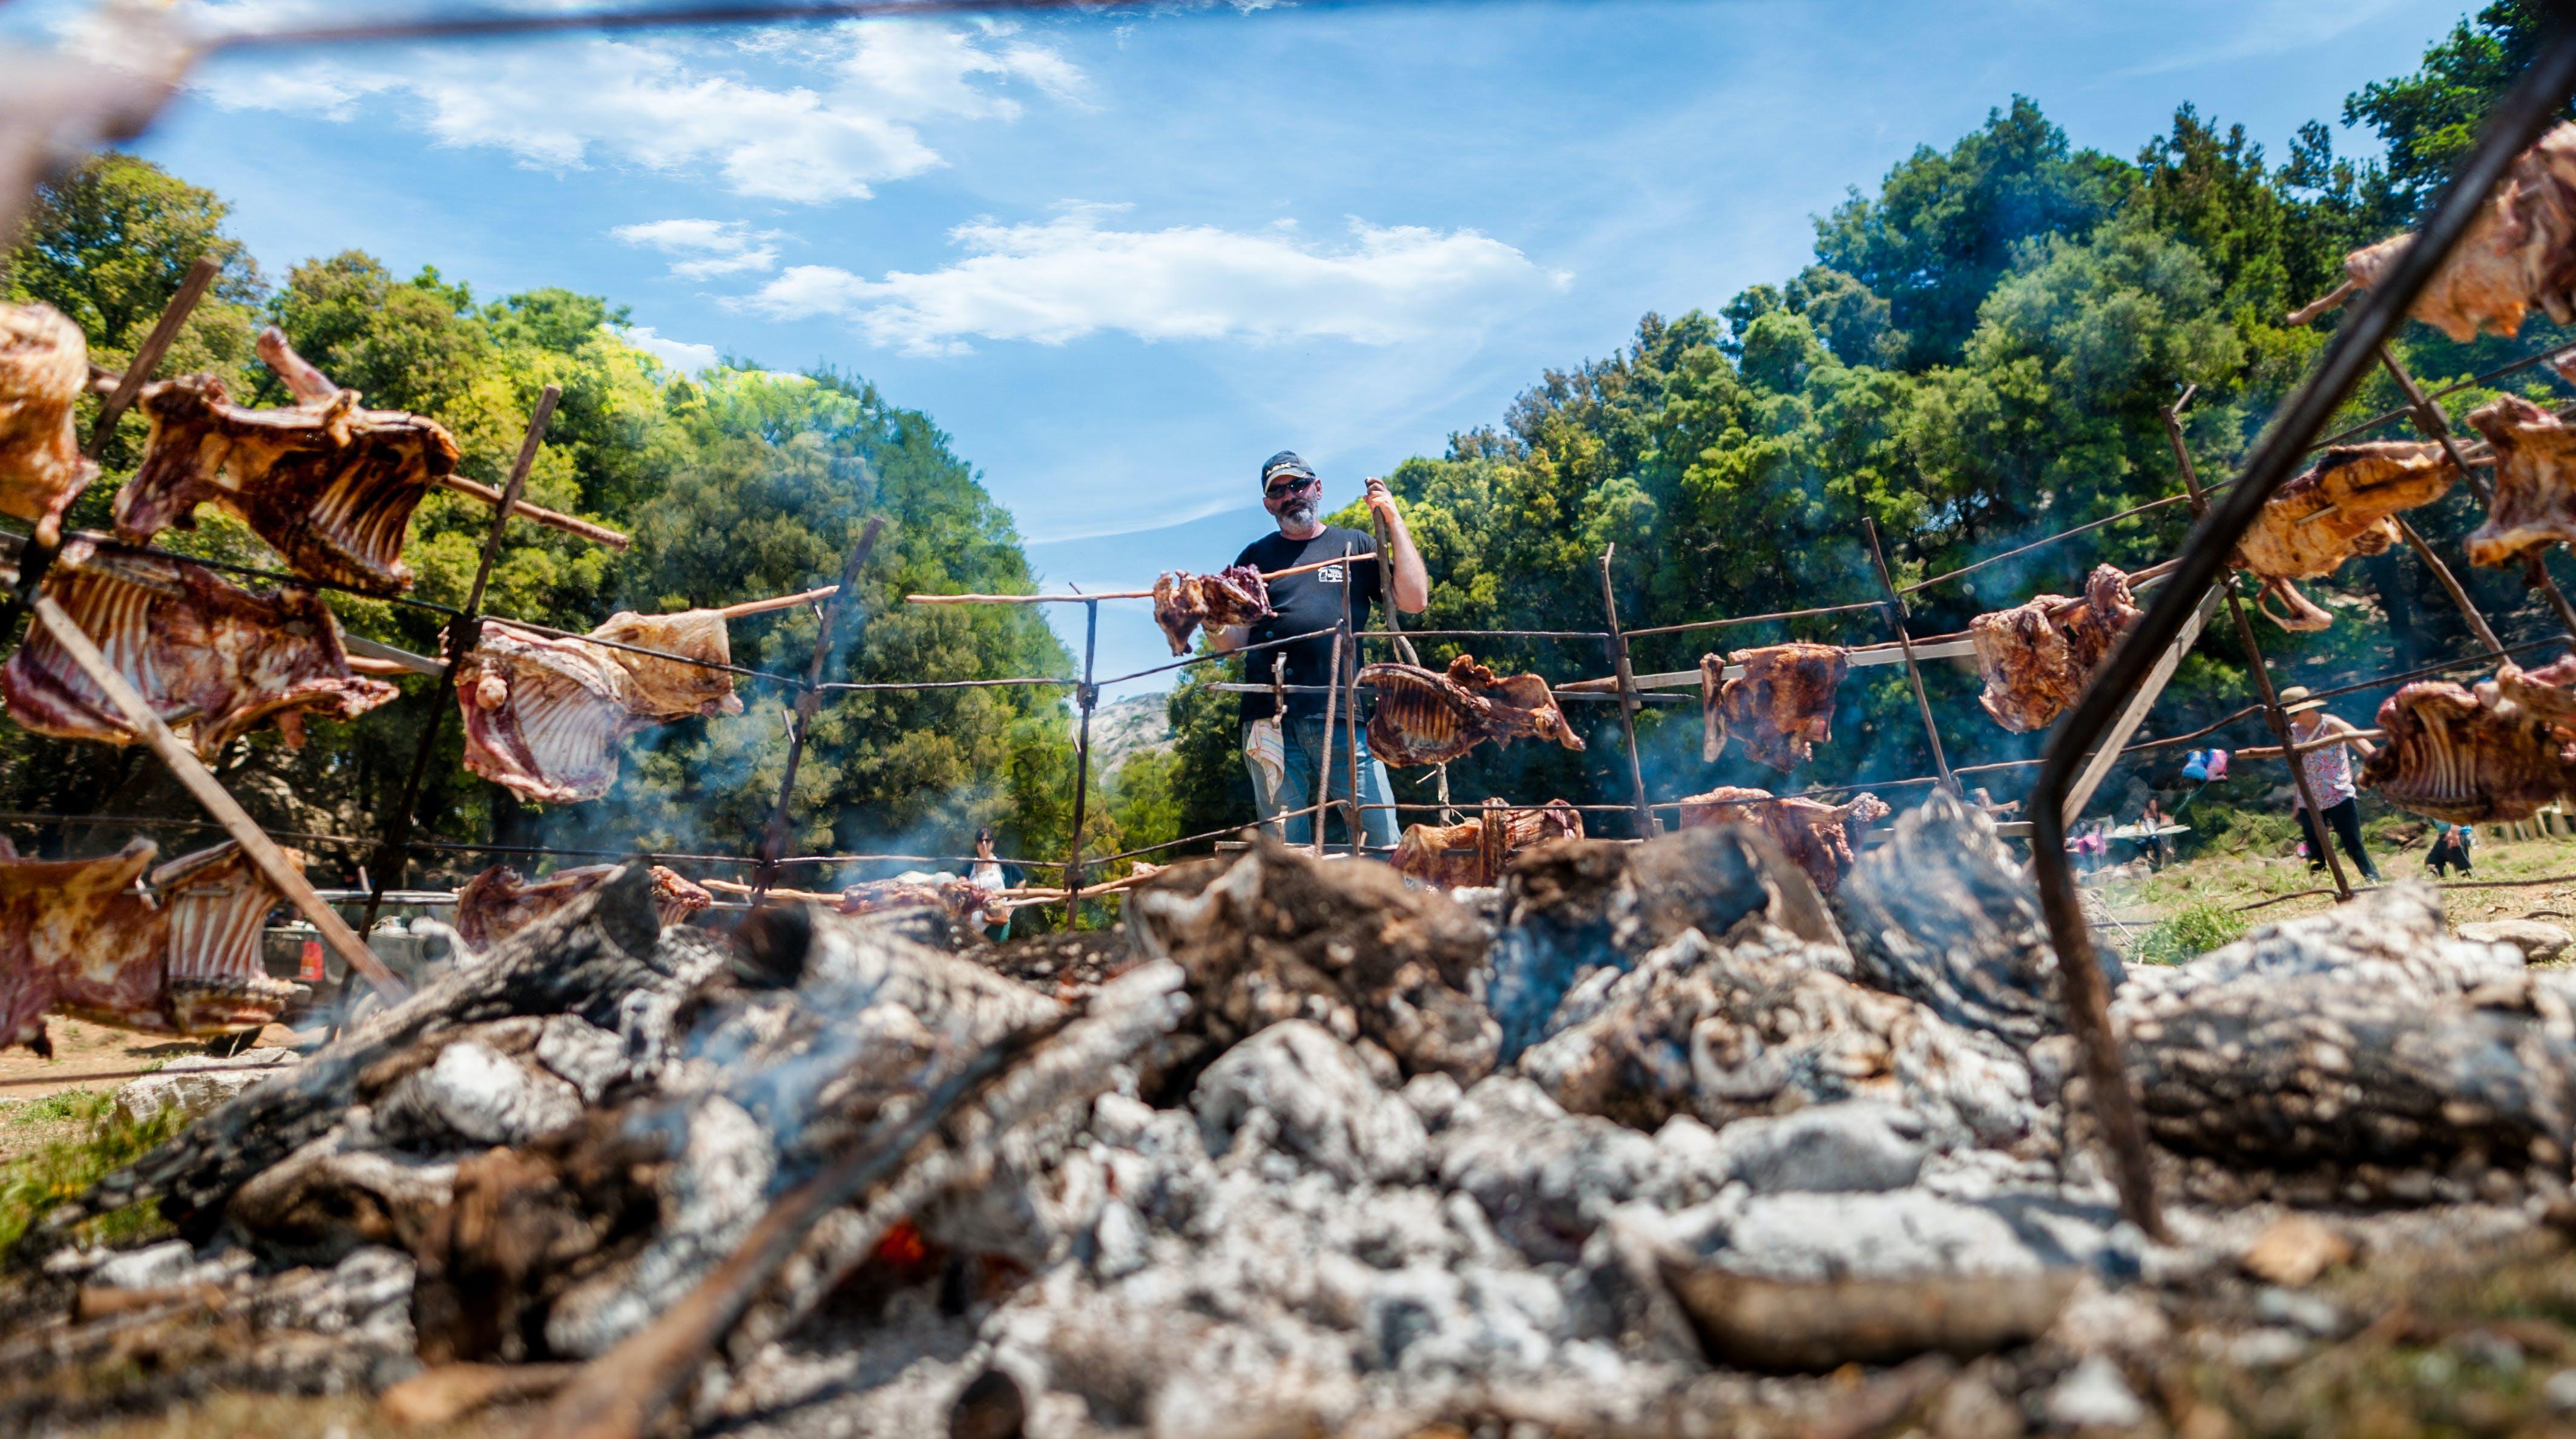 Free stock photo of barbecue, coal, farmer, green field